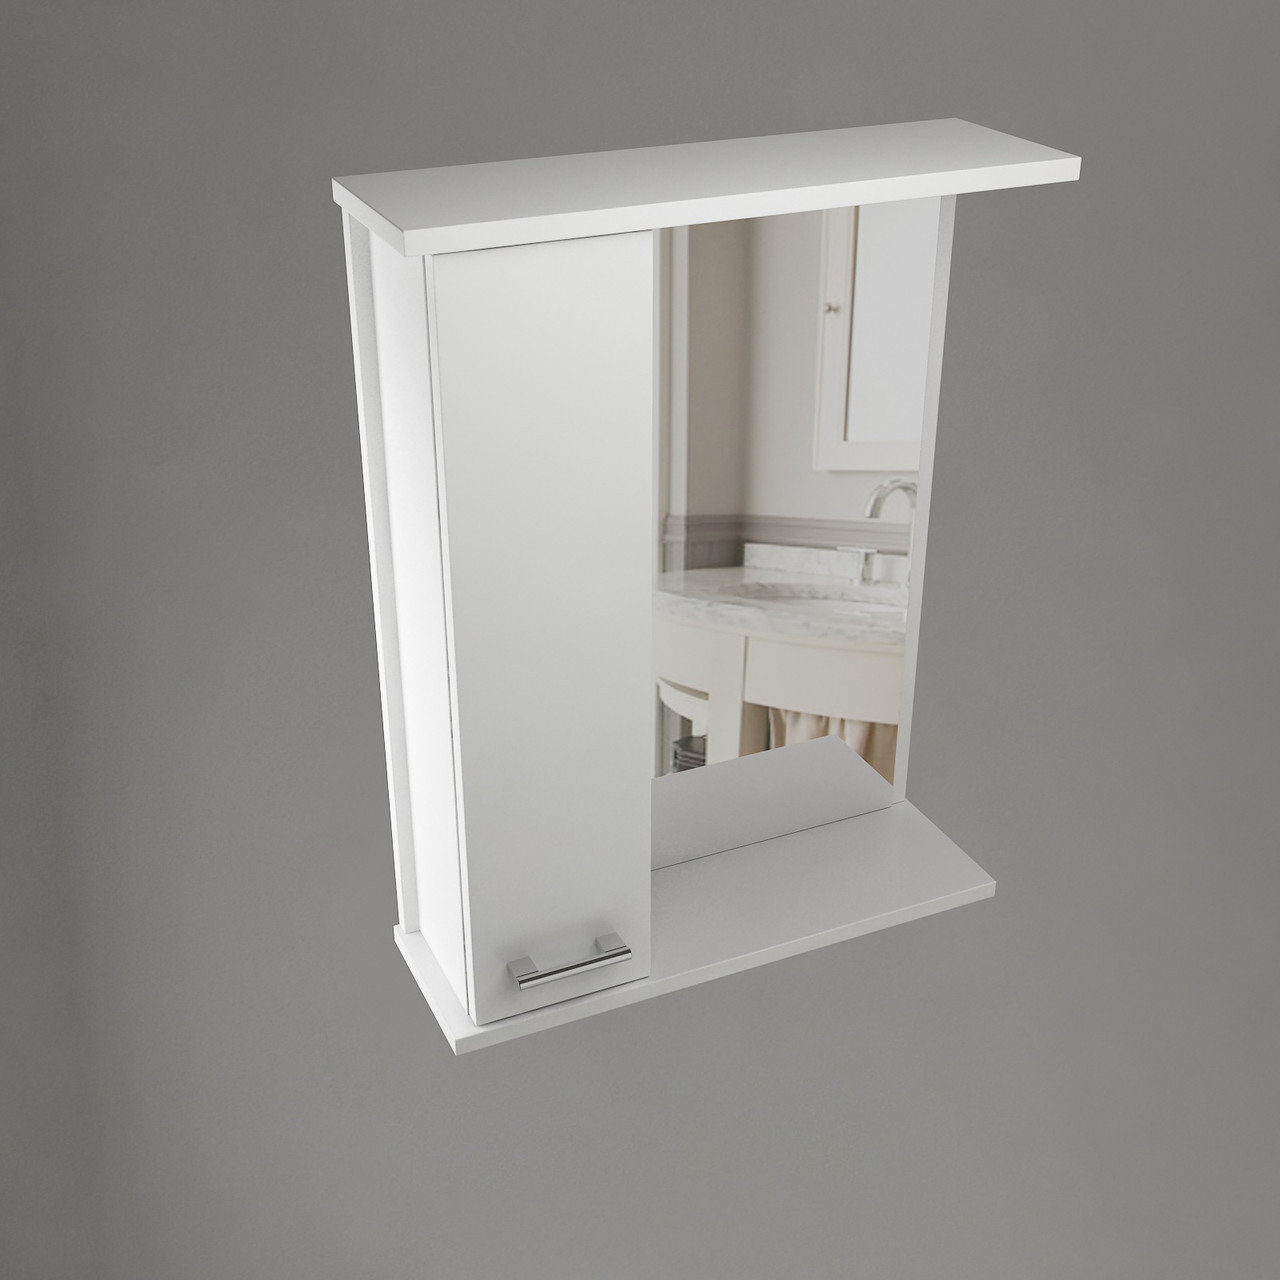 Шкаф навесной Water World, 1 дверь + зеркало, 700,70*70*17 (Стиль, Белый снег, Молочный глянец)(4603750000000)